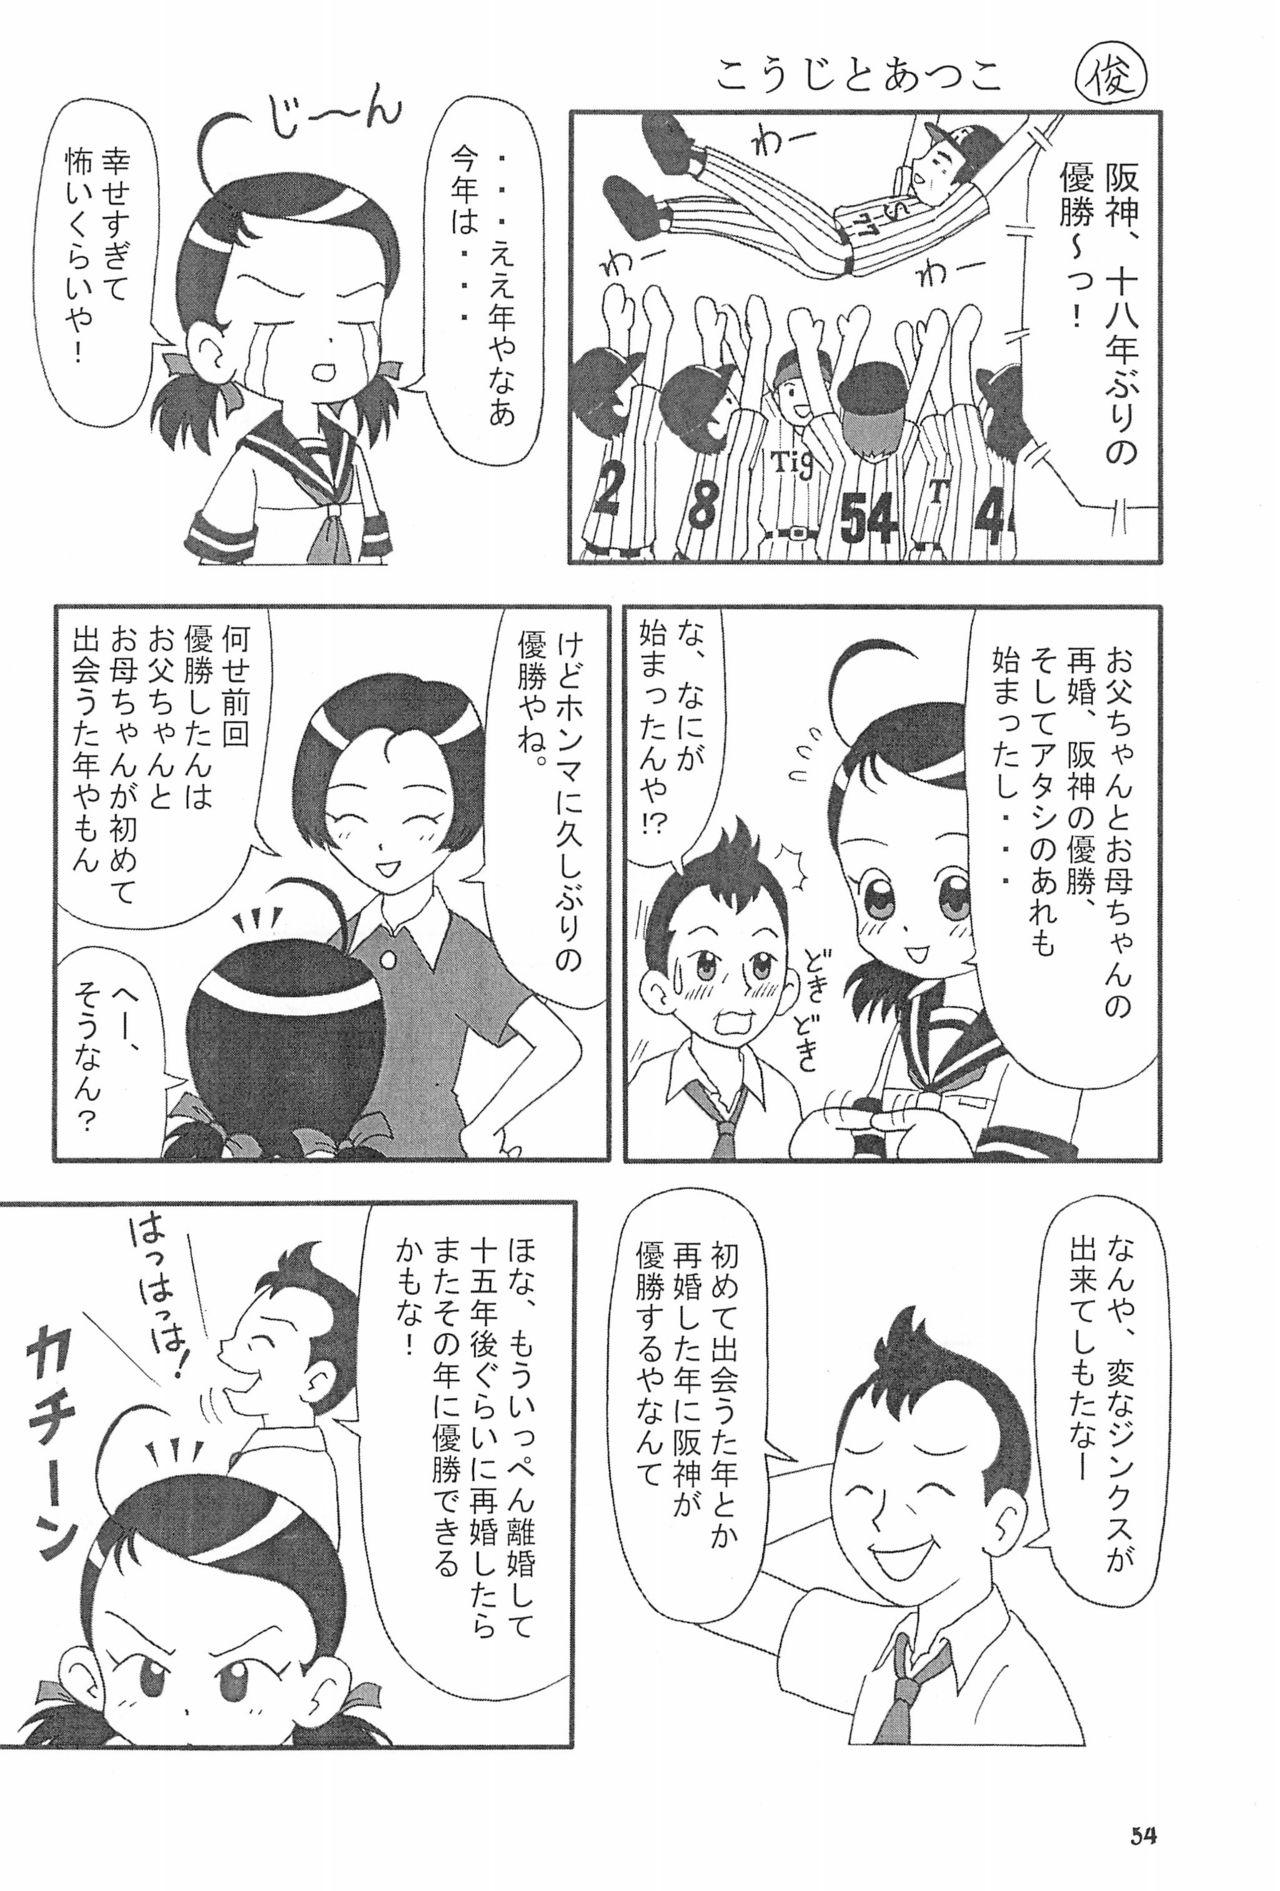 Momo no Kanzume 53